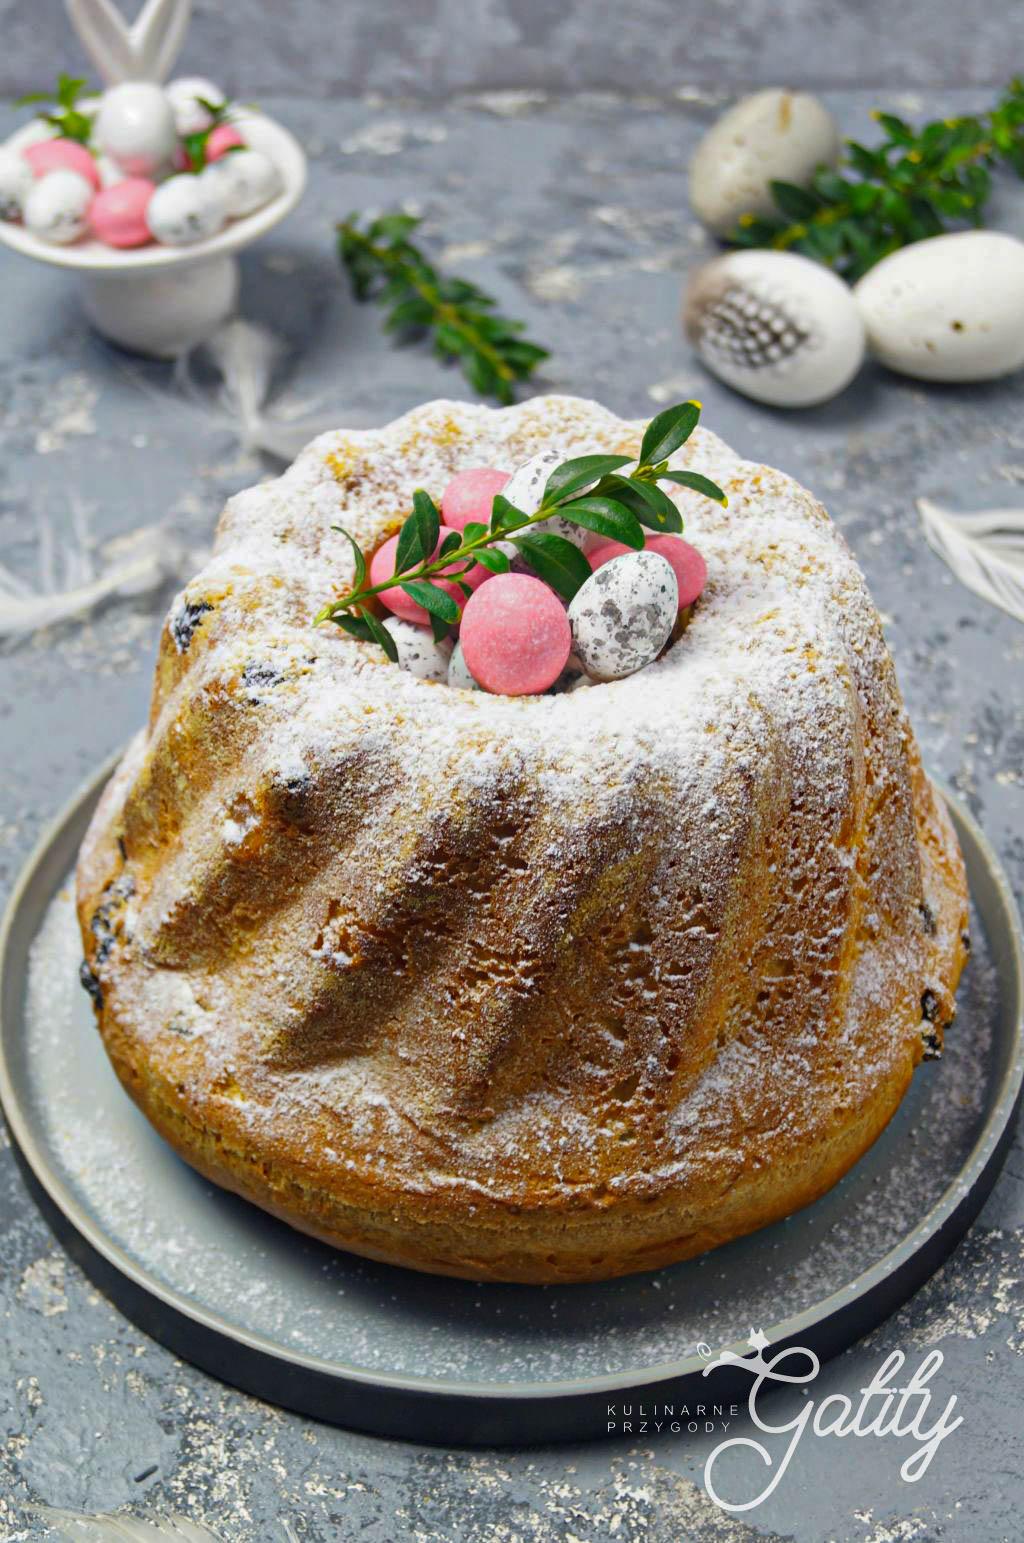 zolte-ciasto-z-jajkami